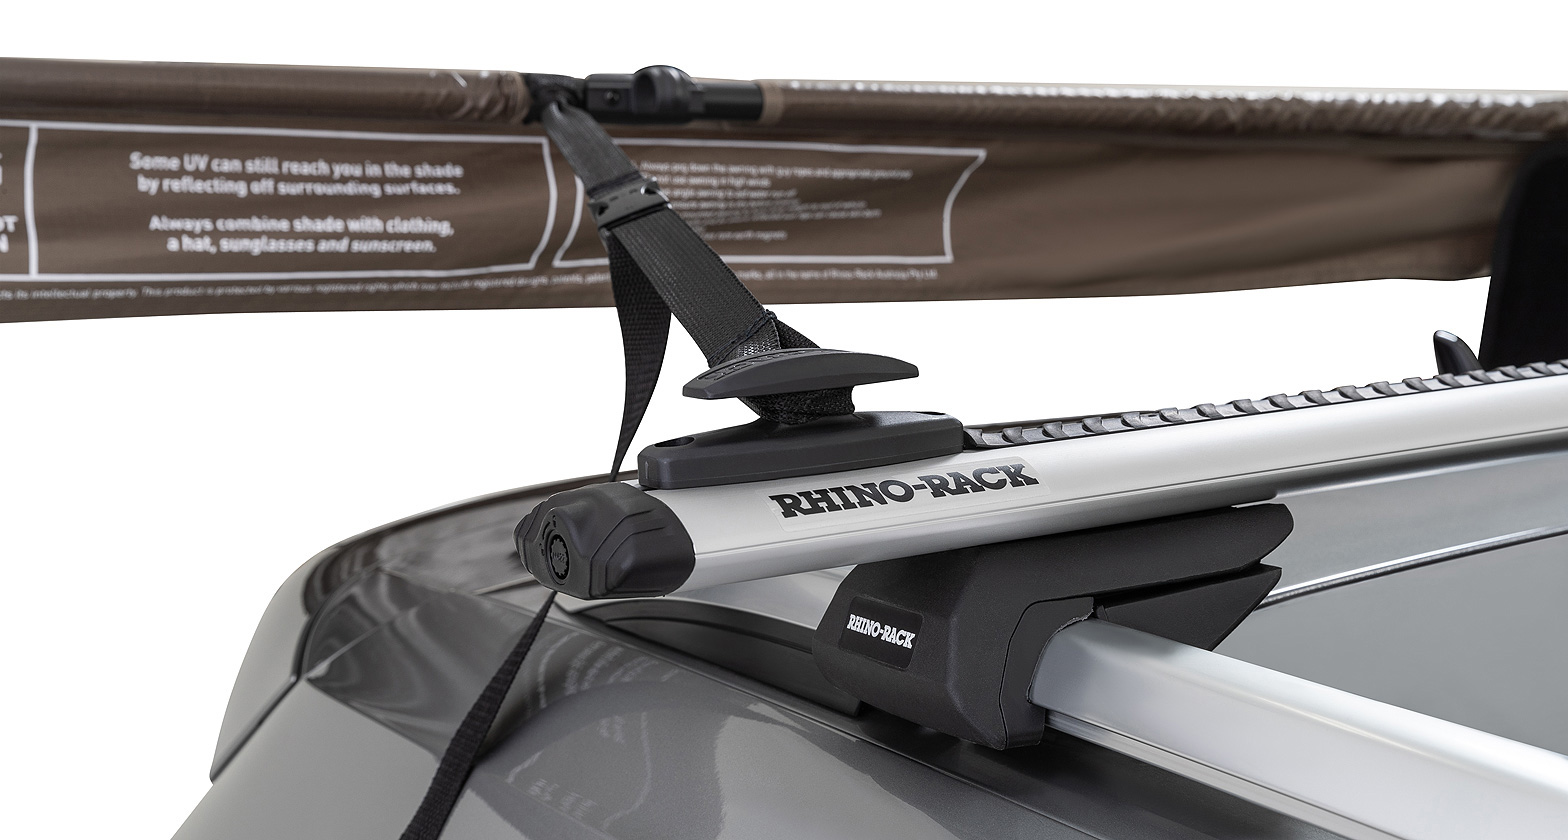 #33300 - Batwing Compact Awning (Left) | Rhino-Rack